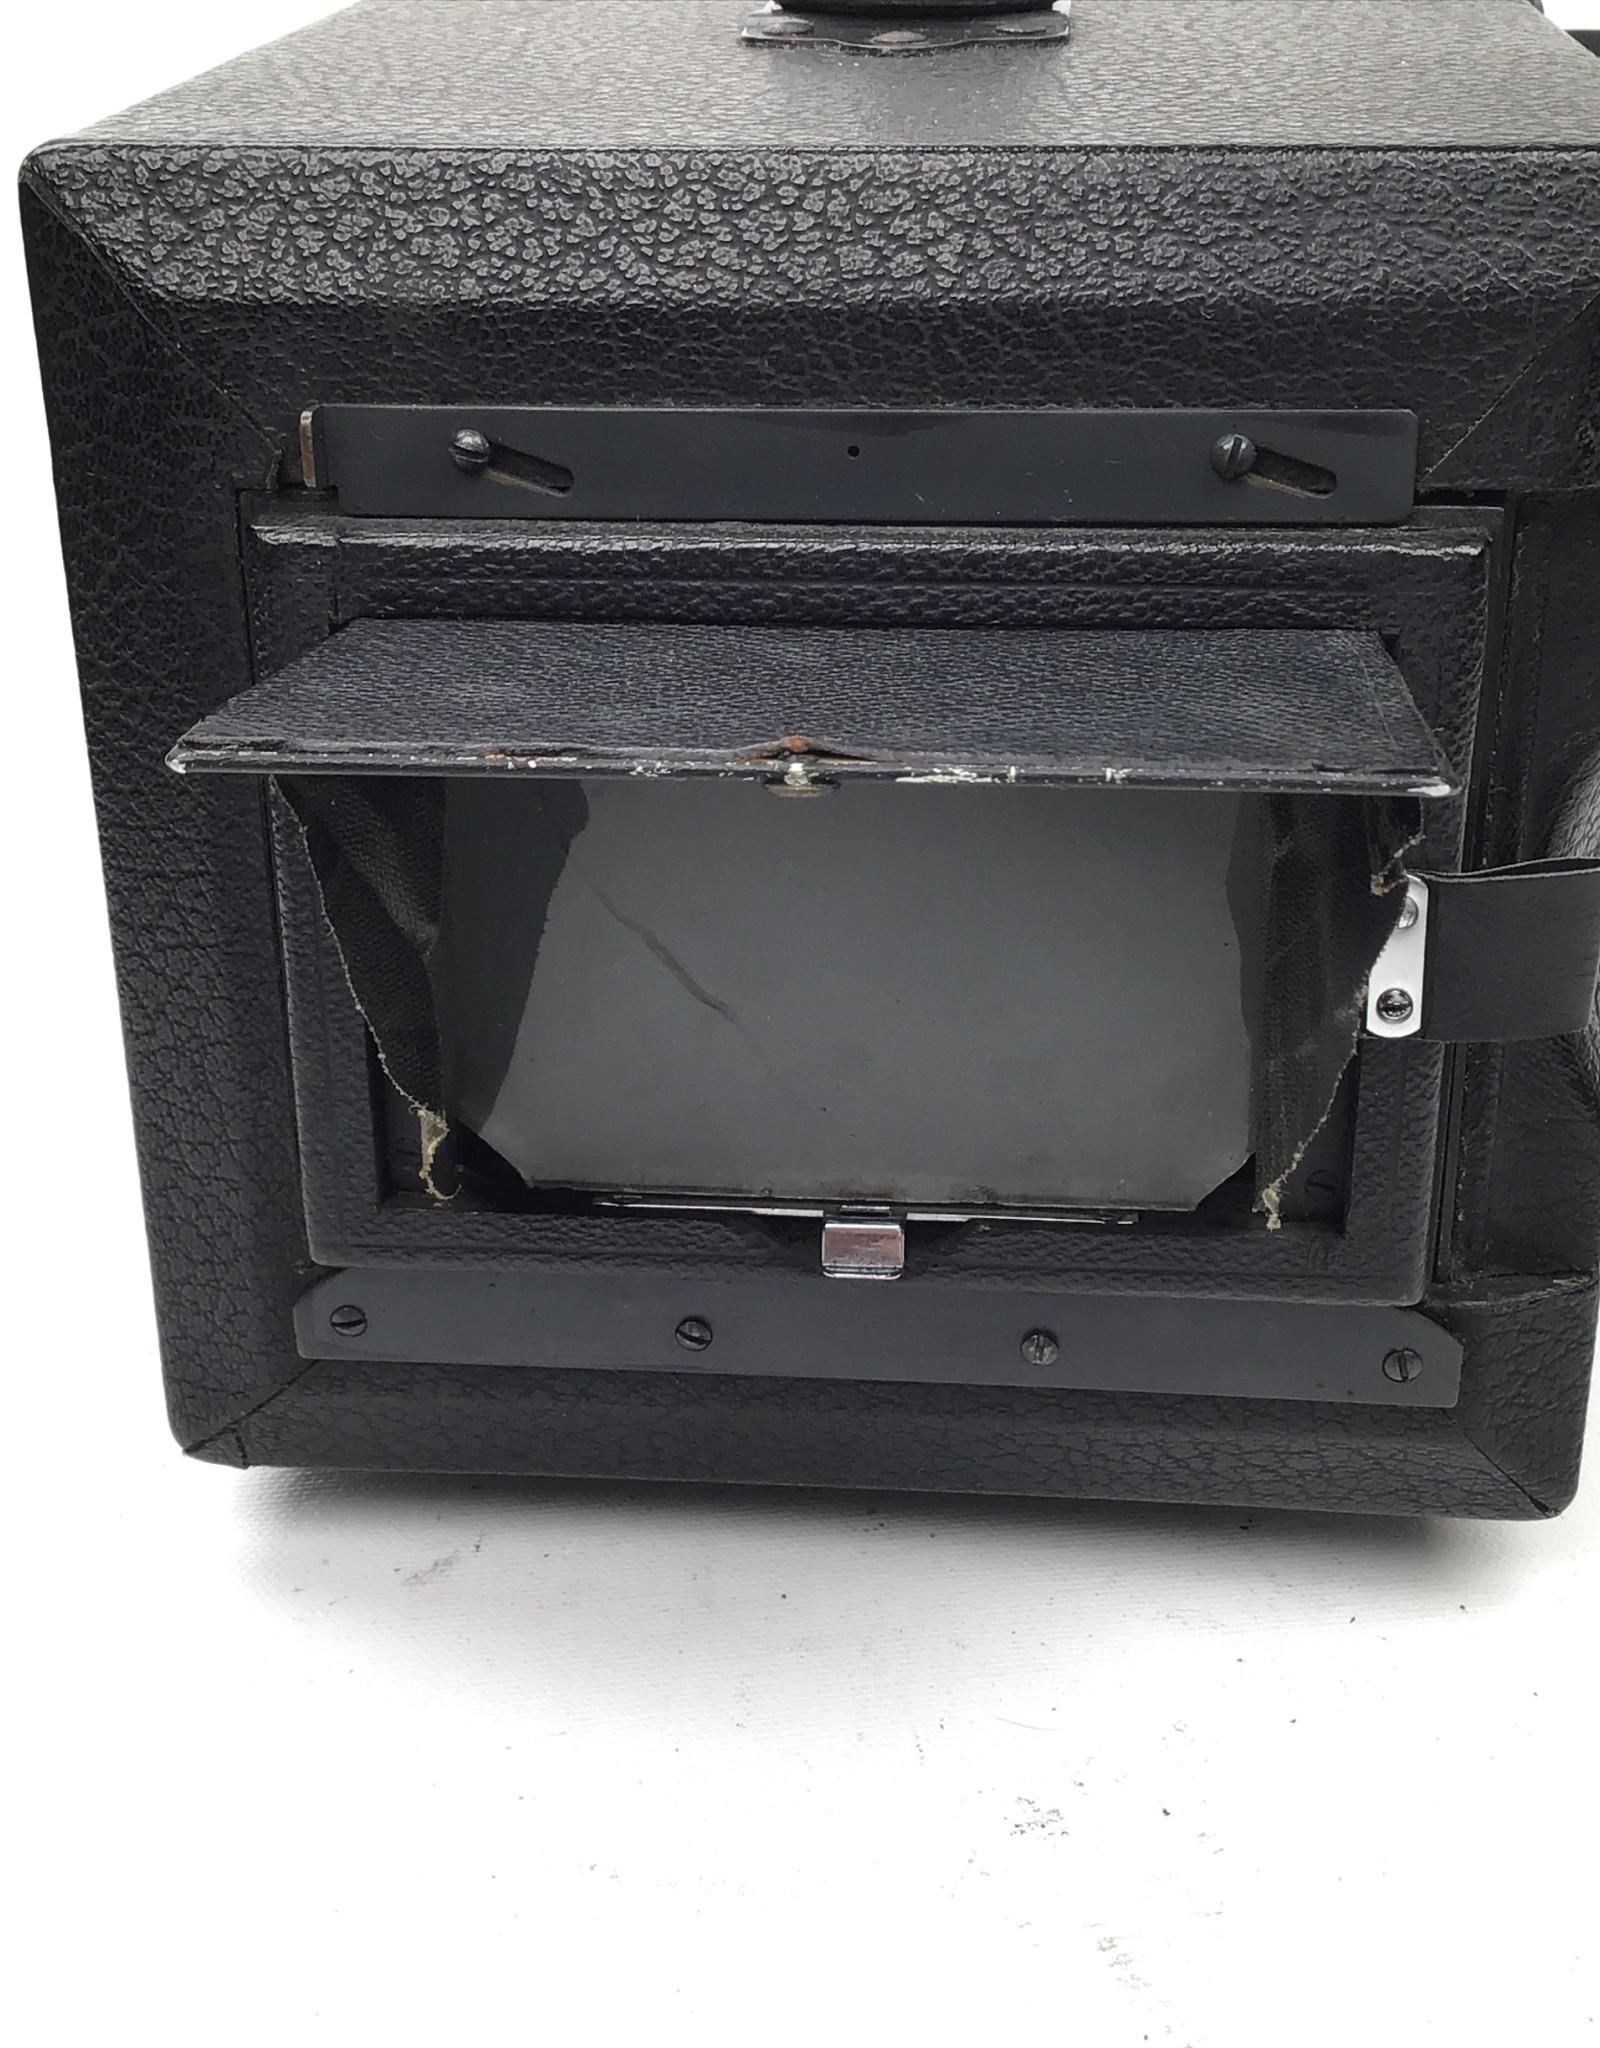 graflex Folmer Graflex Finger Print Camera Used Disp